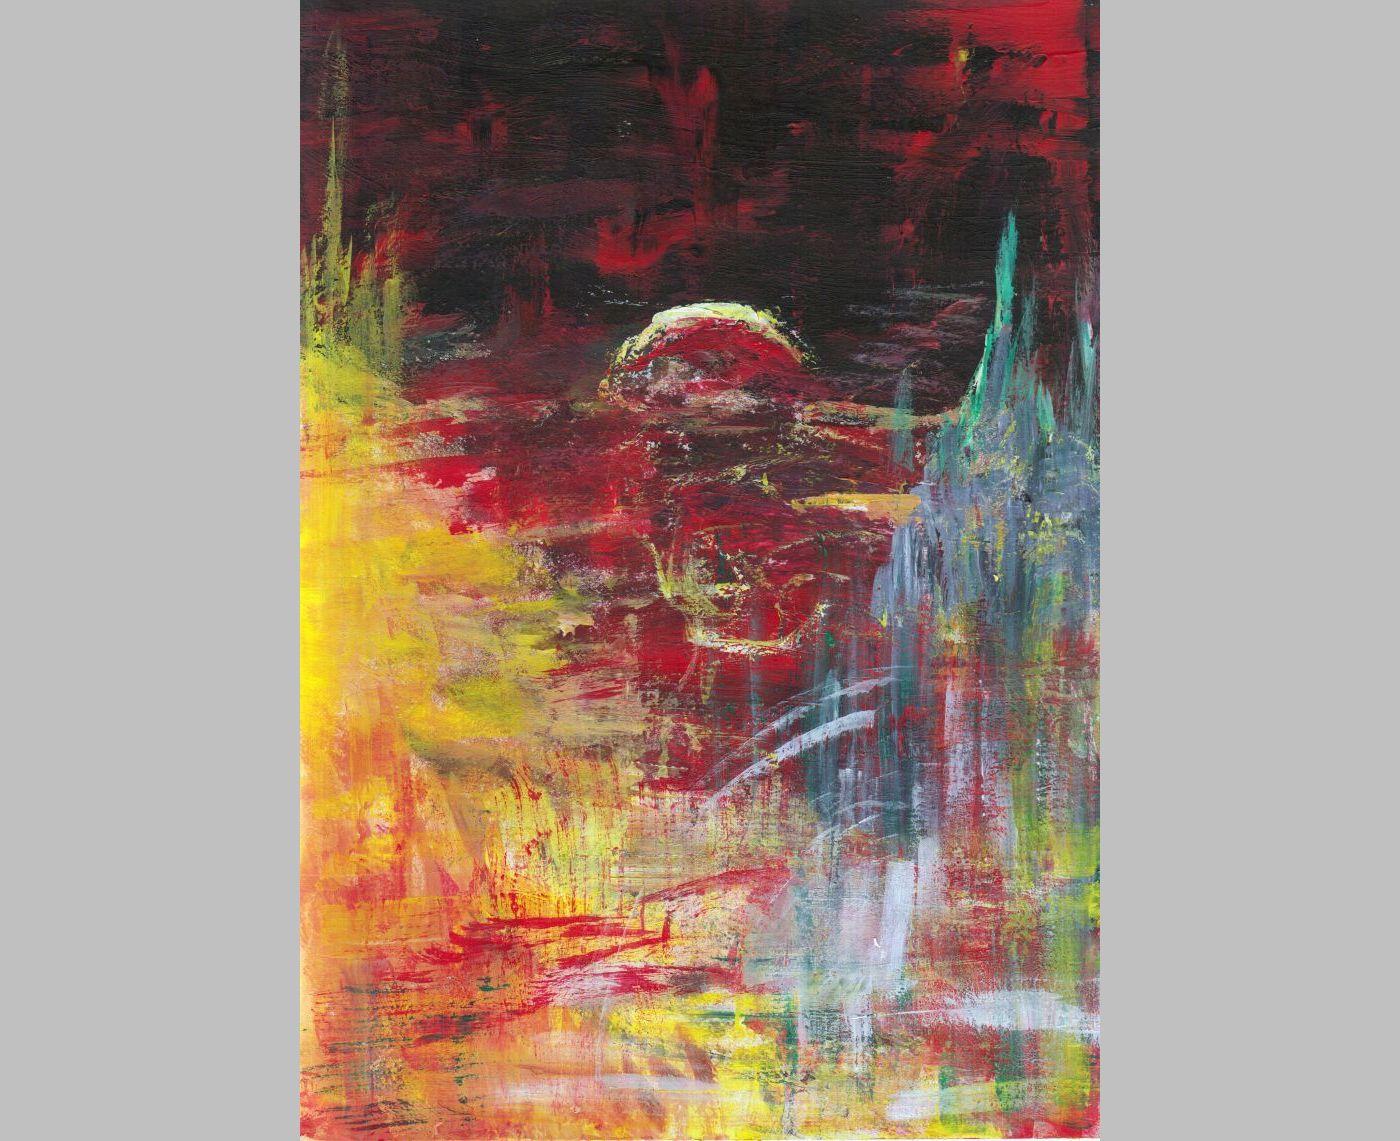 Dämmernde Apokalypse (2013, 21 x 29,7 cm, A4)